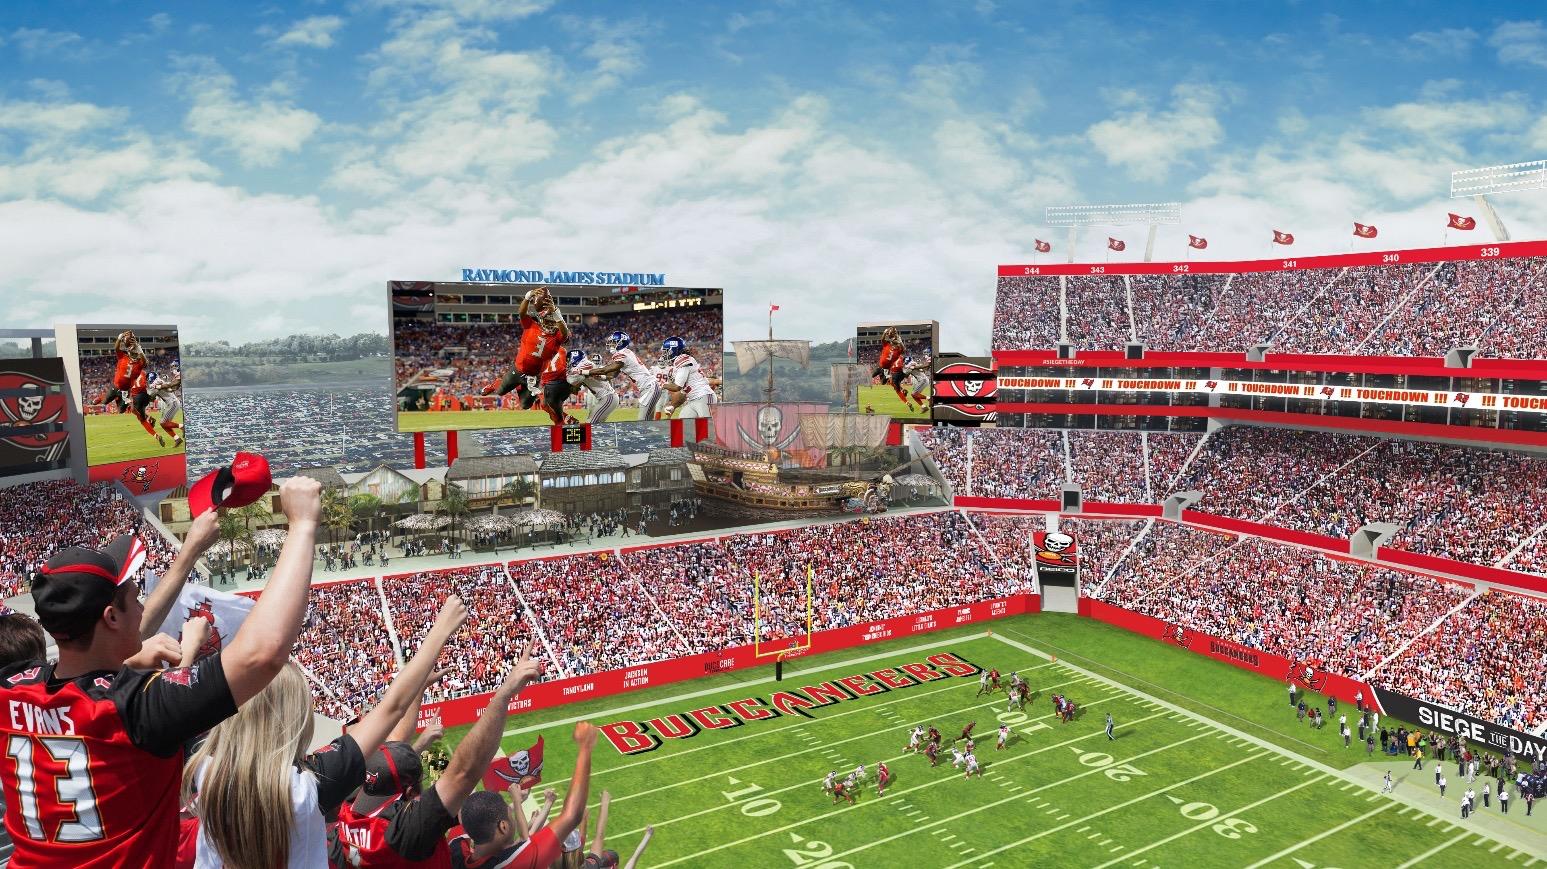 Philadelphia Eagles Wallpaper Hd Raymond James Stadium Renovations Begin Football Stadium